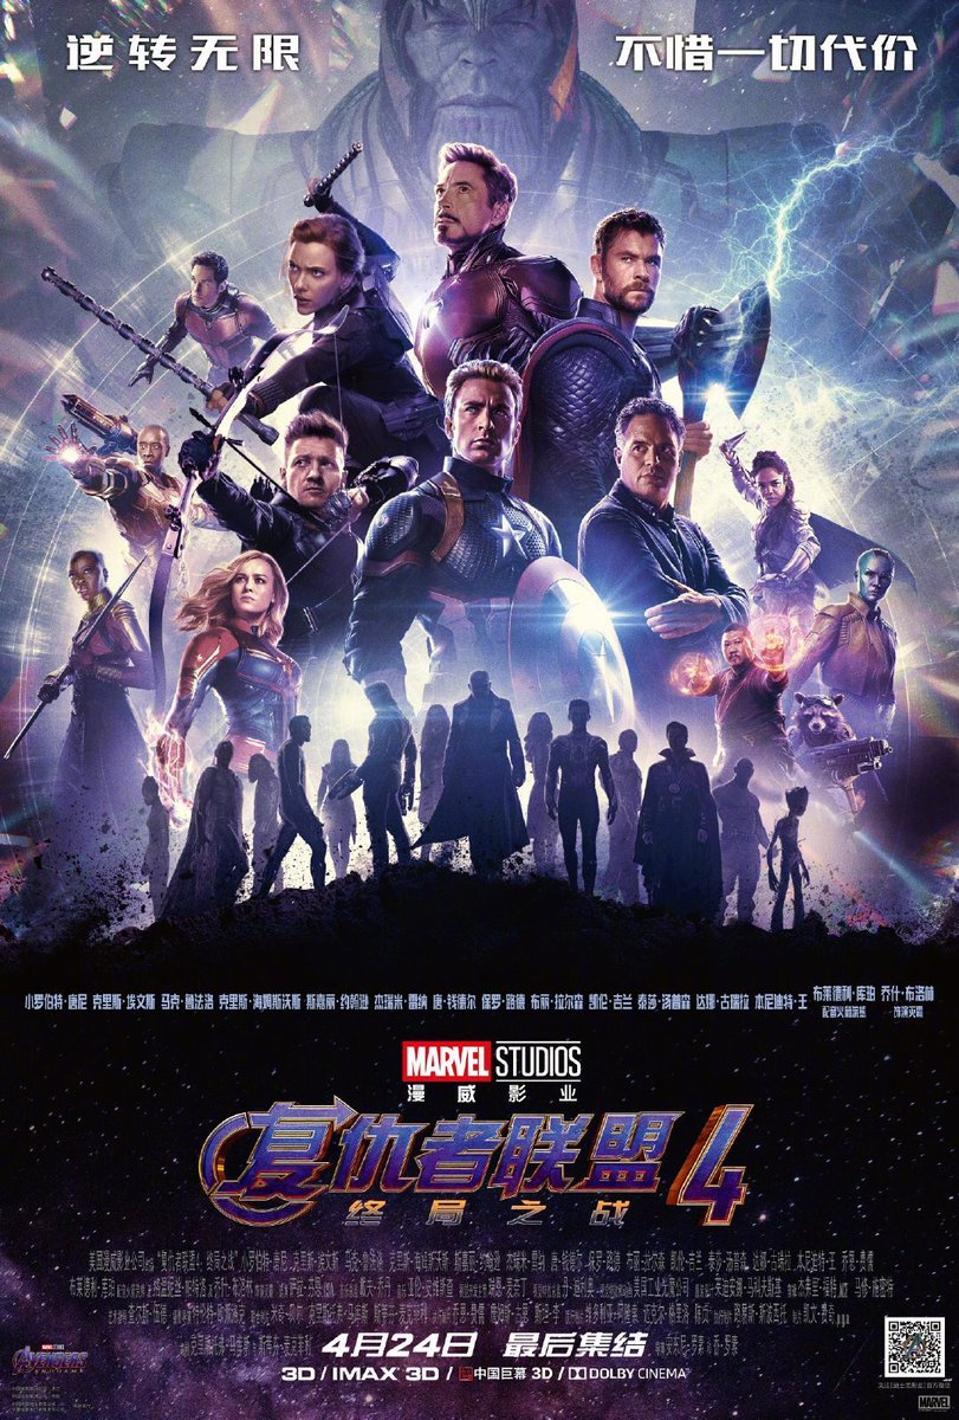 Marvel Avengers Endgame Movie Poster Maxi Prints 2019 Infinity War 2-1671